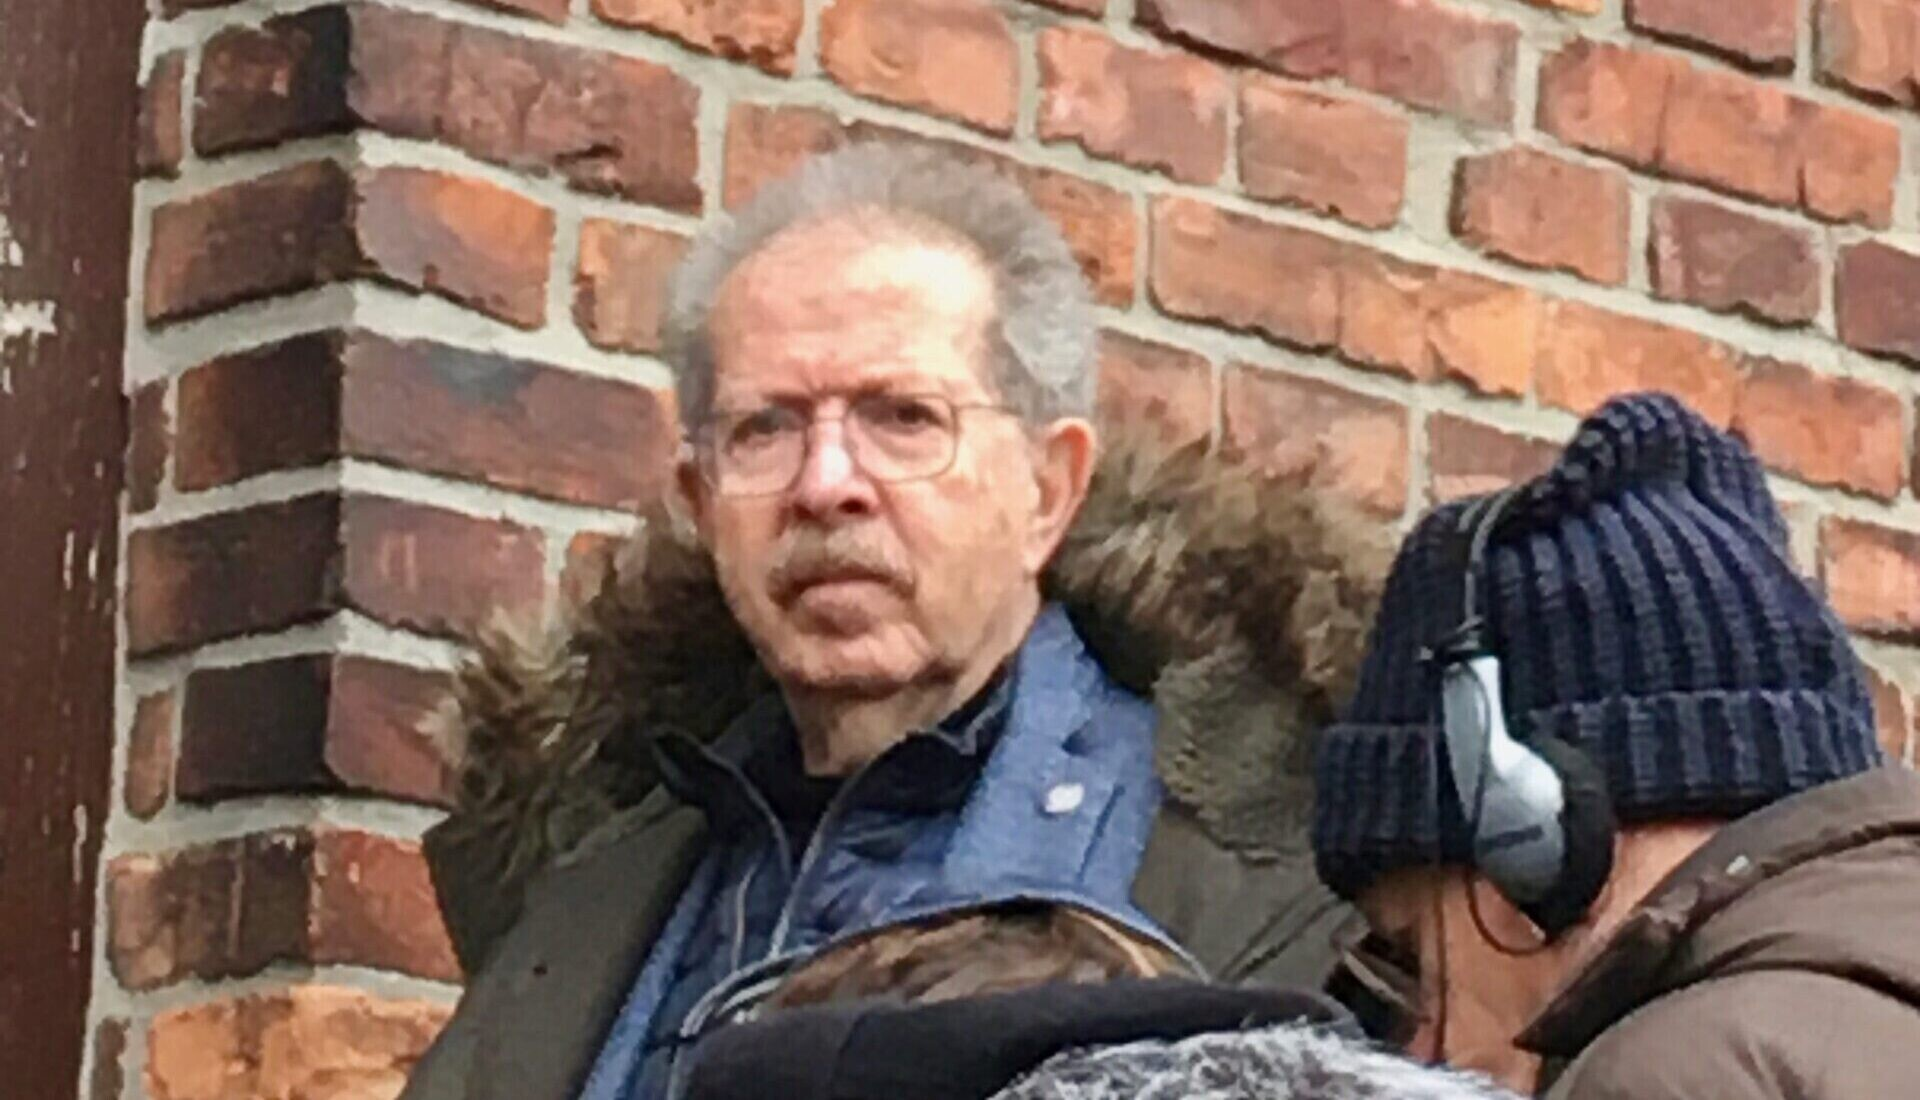 Menachem Rosensaft tours Block 11 at Auschwitz-Birkenau, where prisoners like his father underwent punishment, Jan. 28, 2020. (Jewish Week)